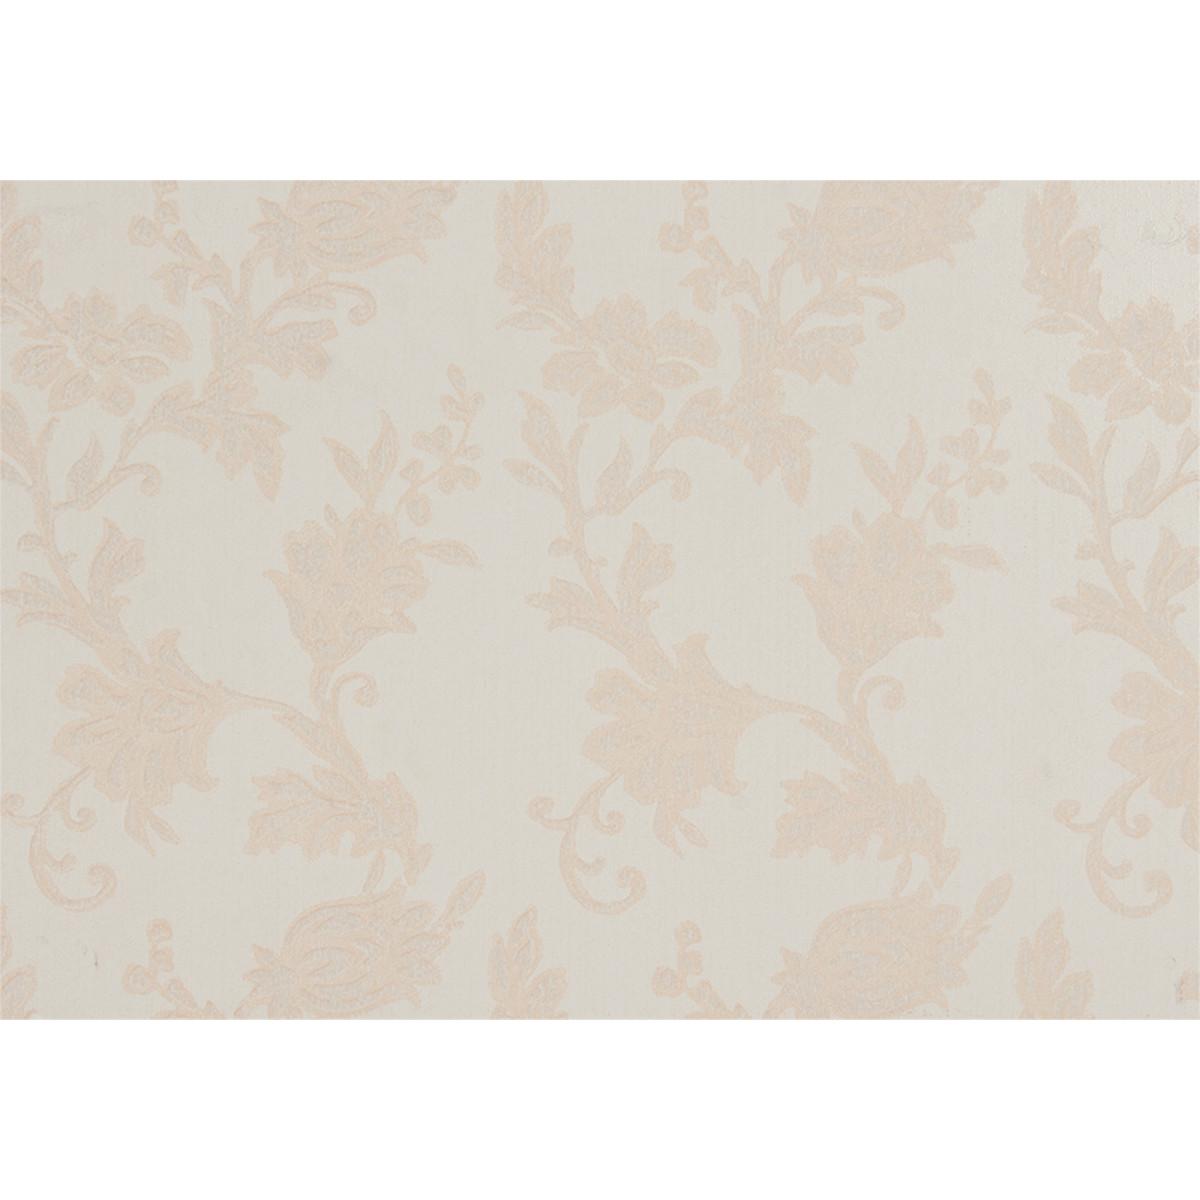 Плитка настенная Шелк 40х27.5 см 1.65 м2 цвет бежевый